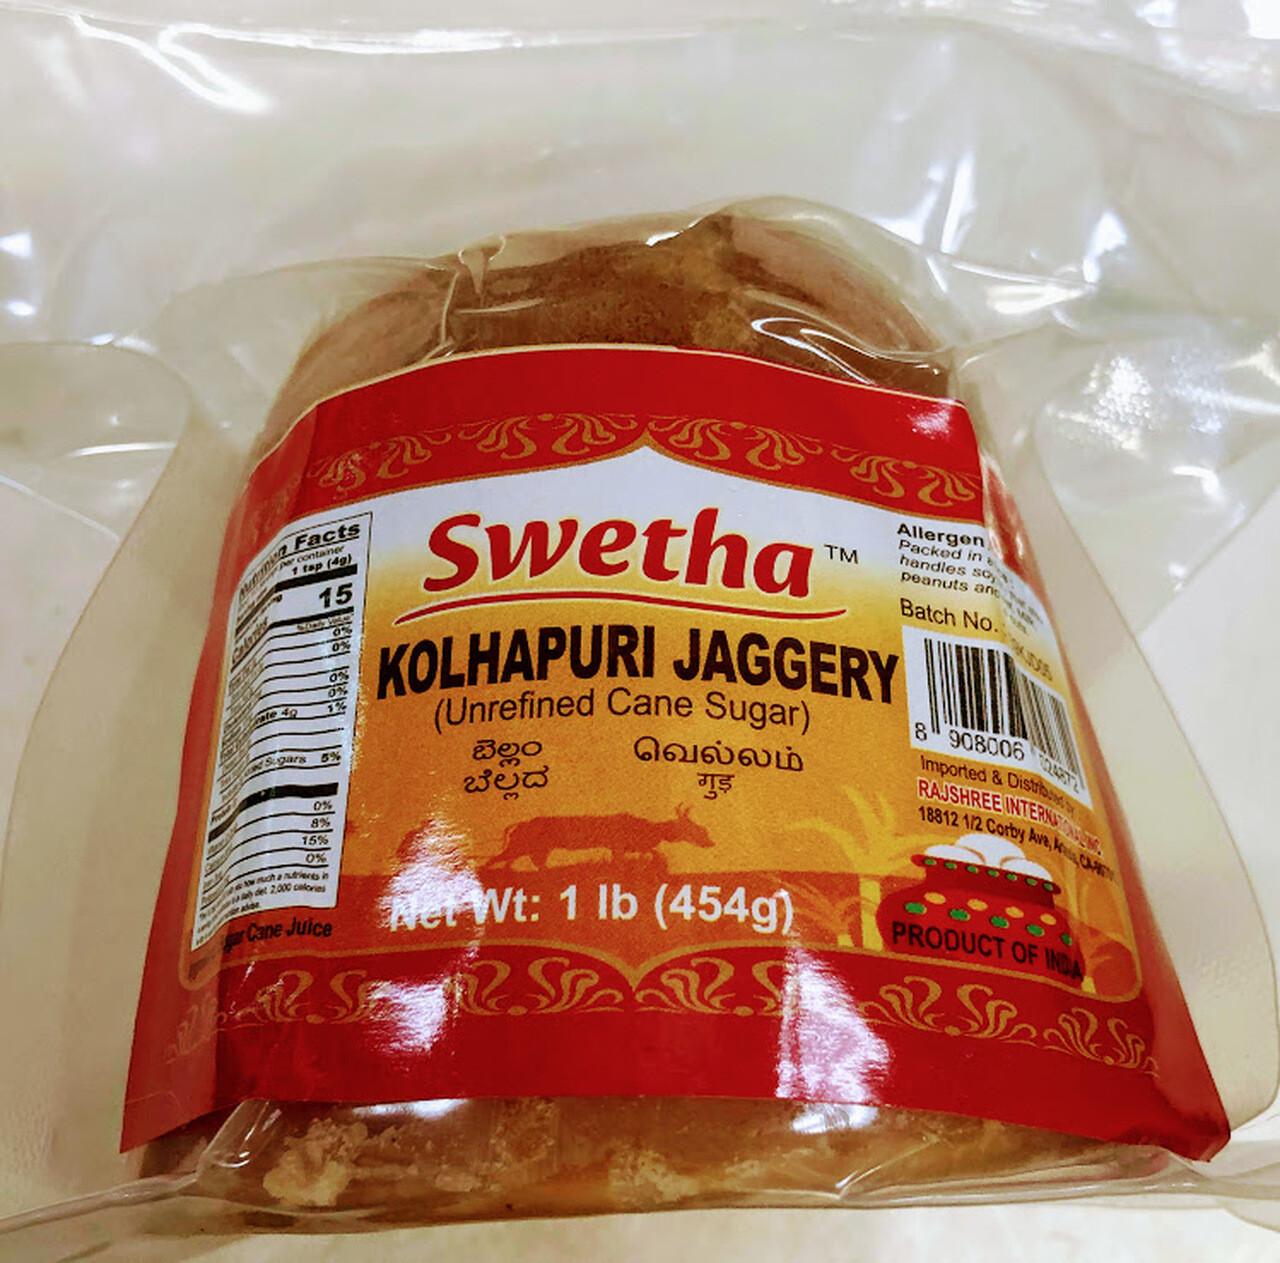 Swetha Kolhapuri Jaggery 1Lb